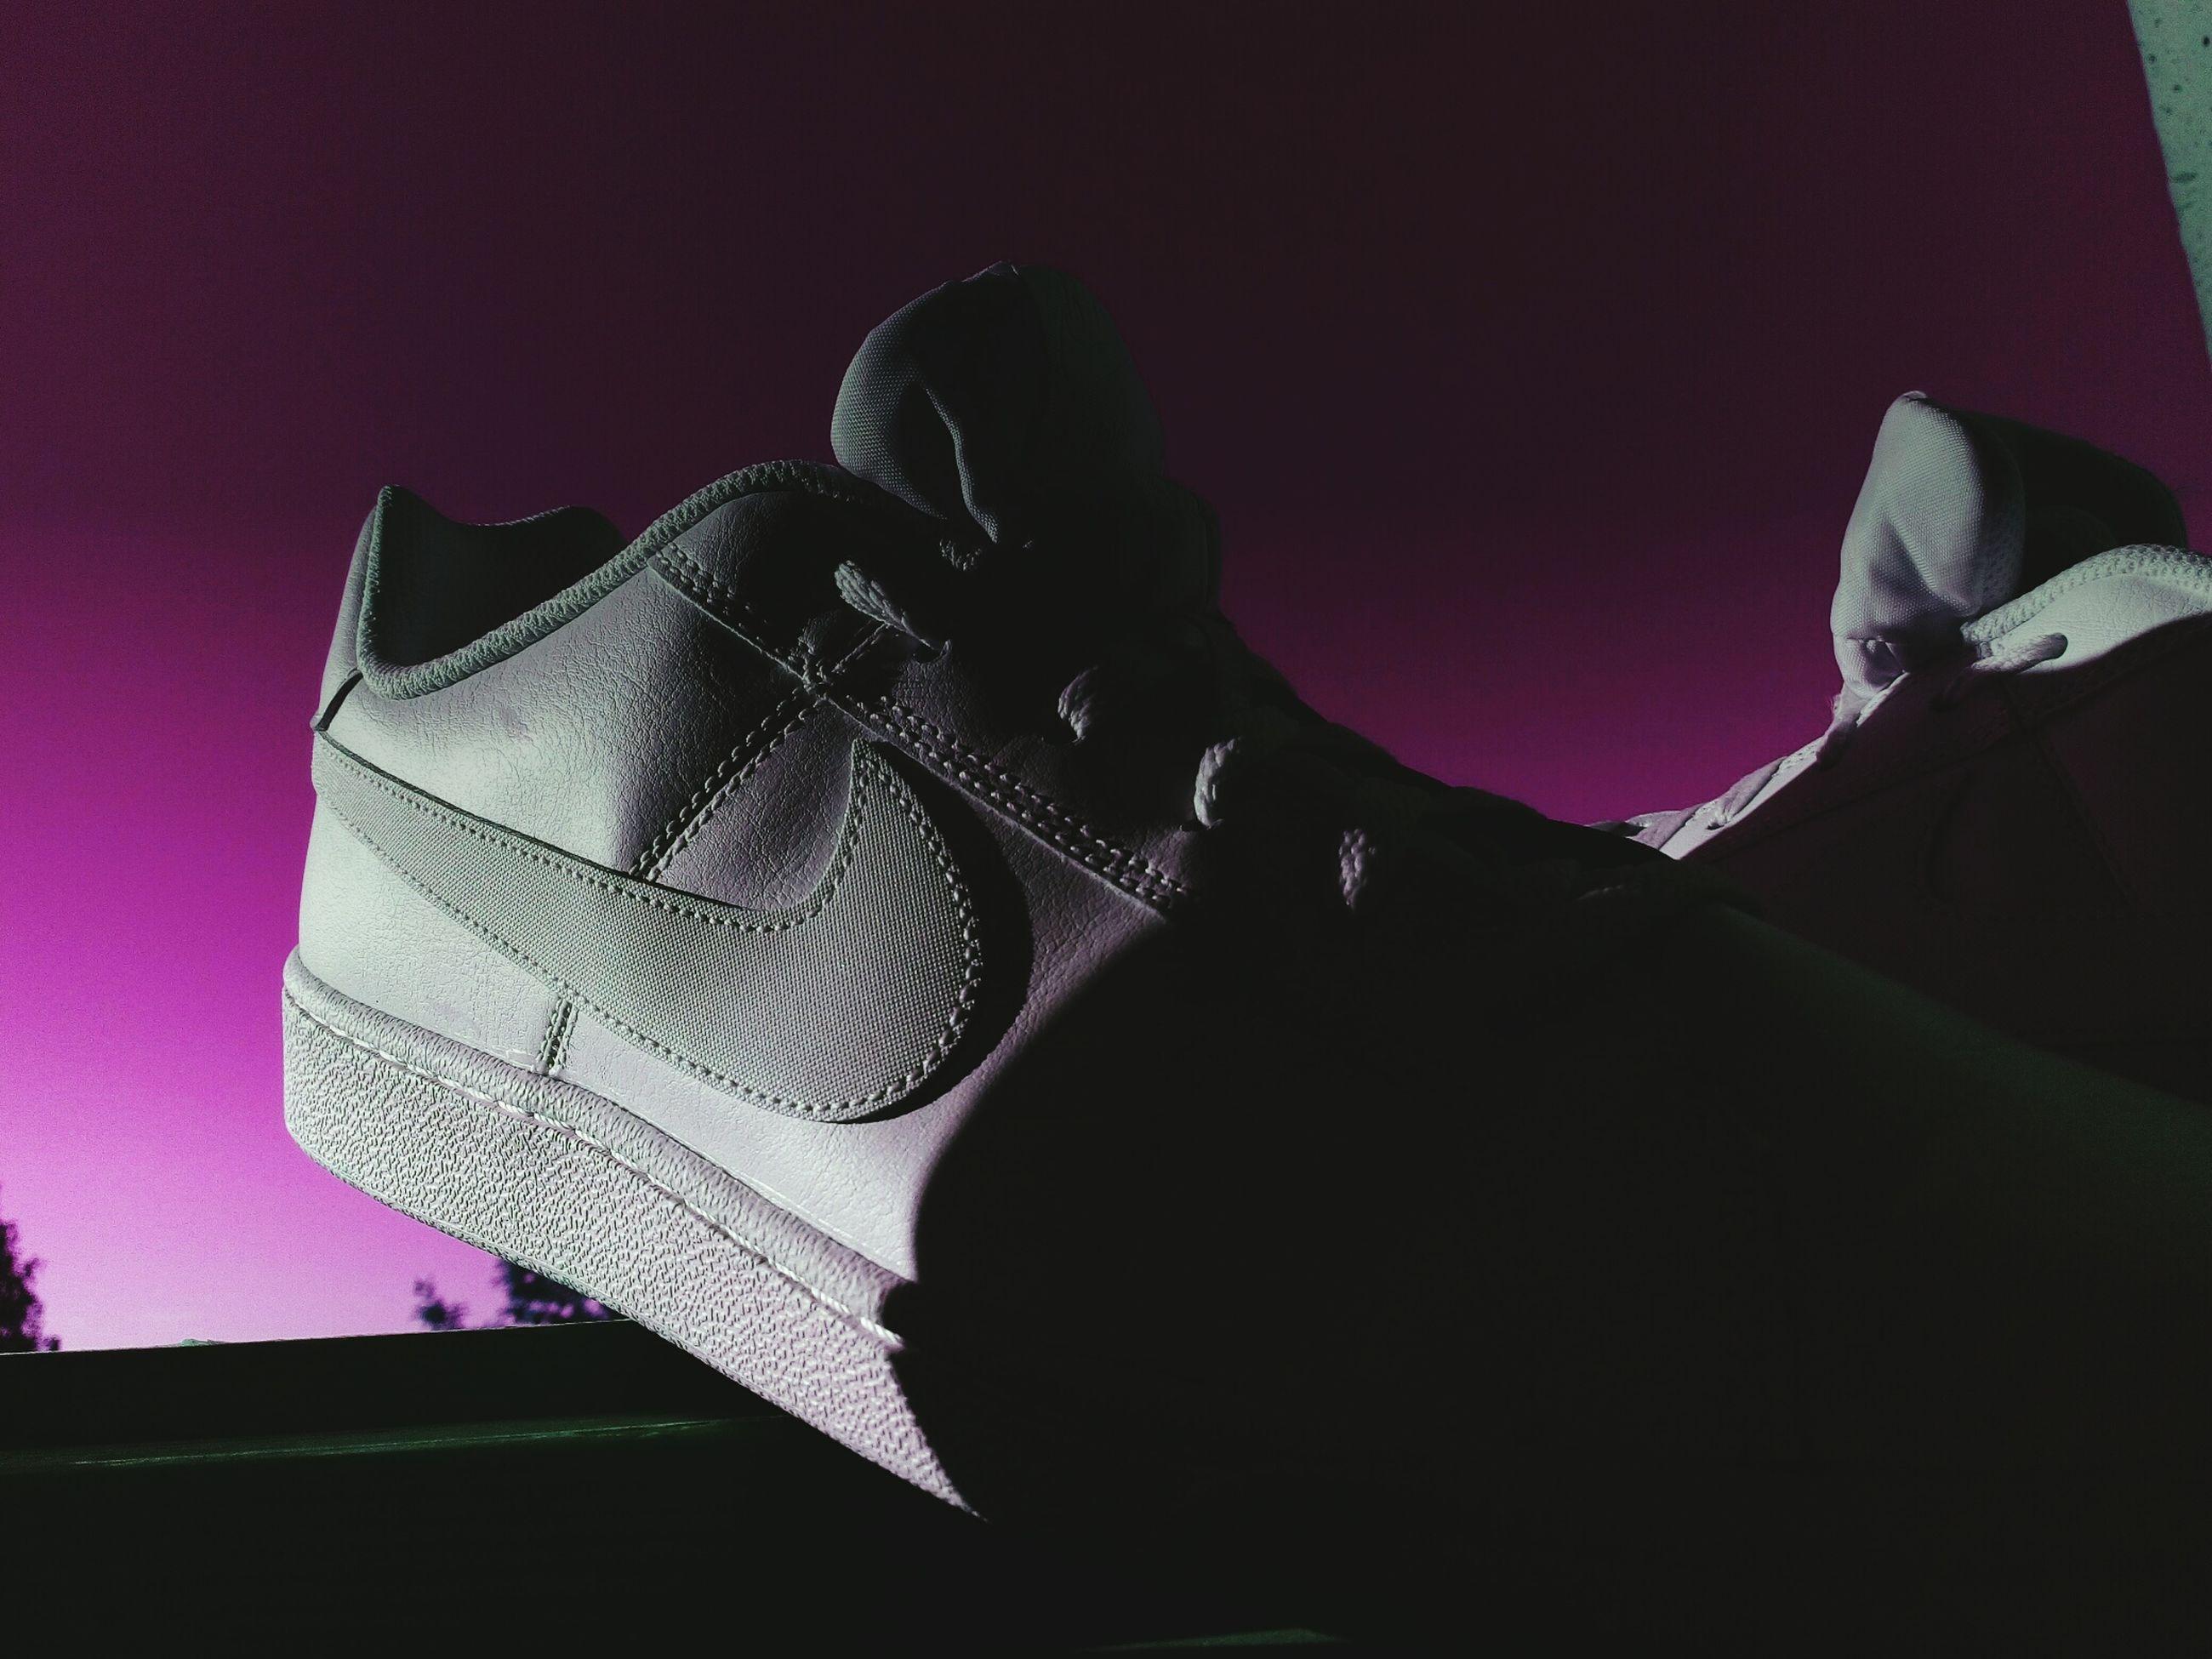 shoe, studio shot, menswear, indoors, pair, no people, close-up, day